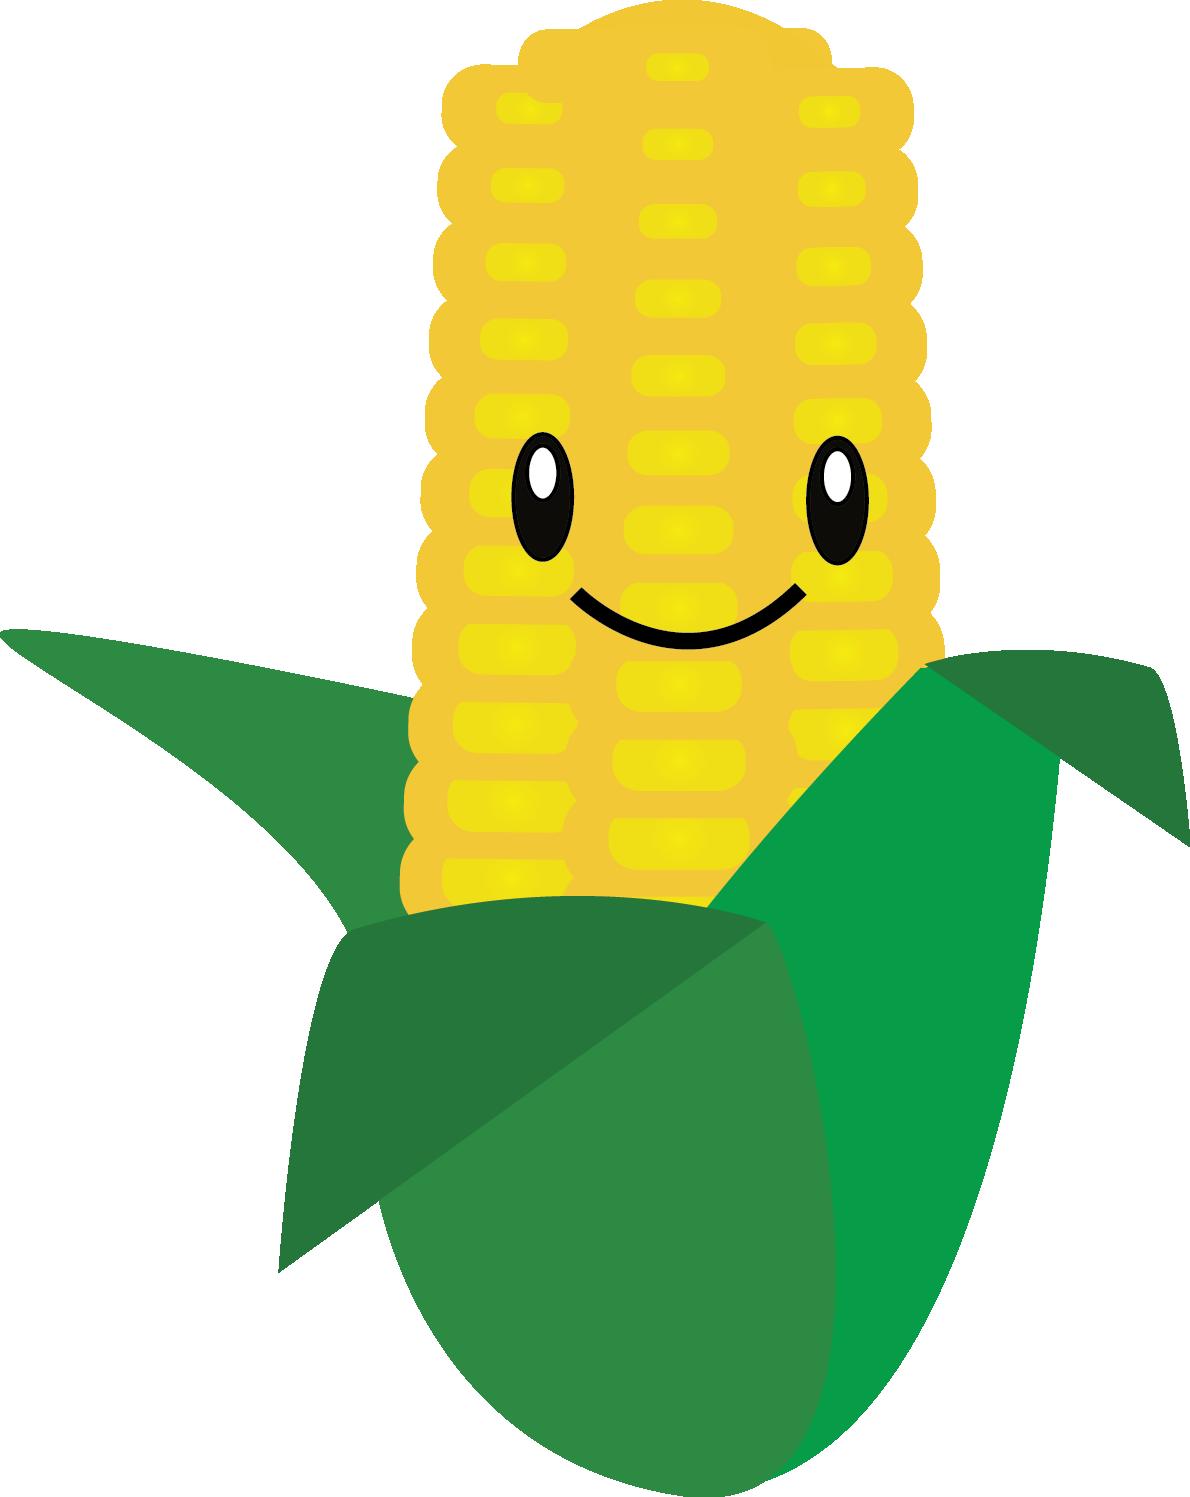 Grains clipart corn grain. Curriculm nutrition education program